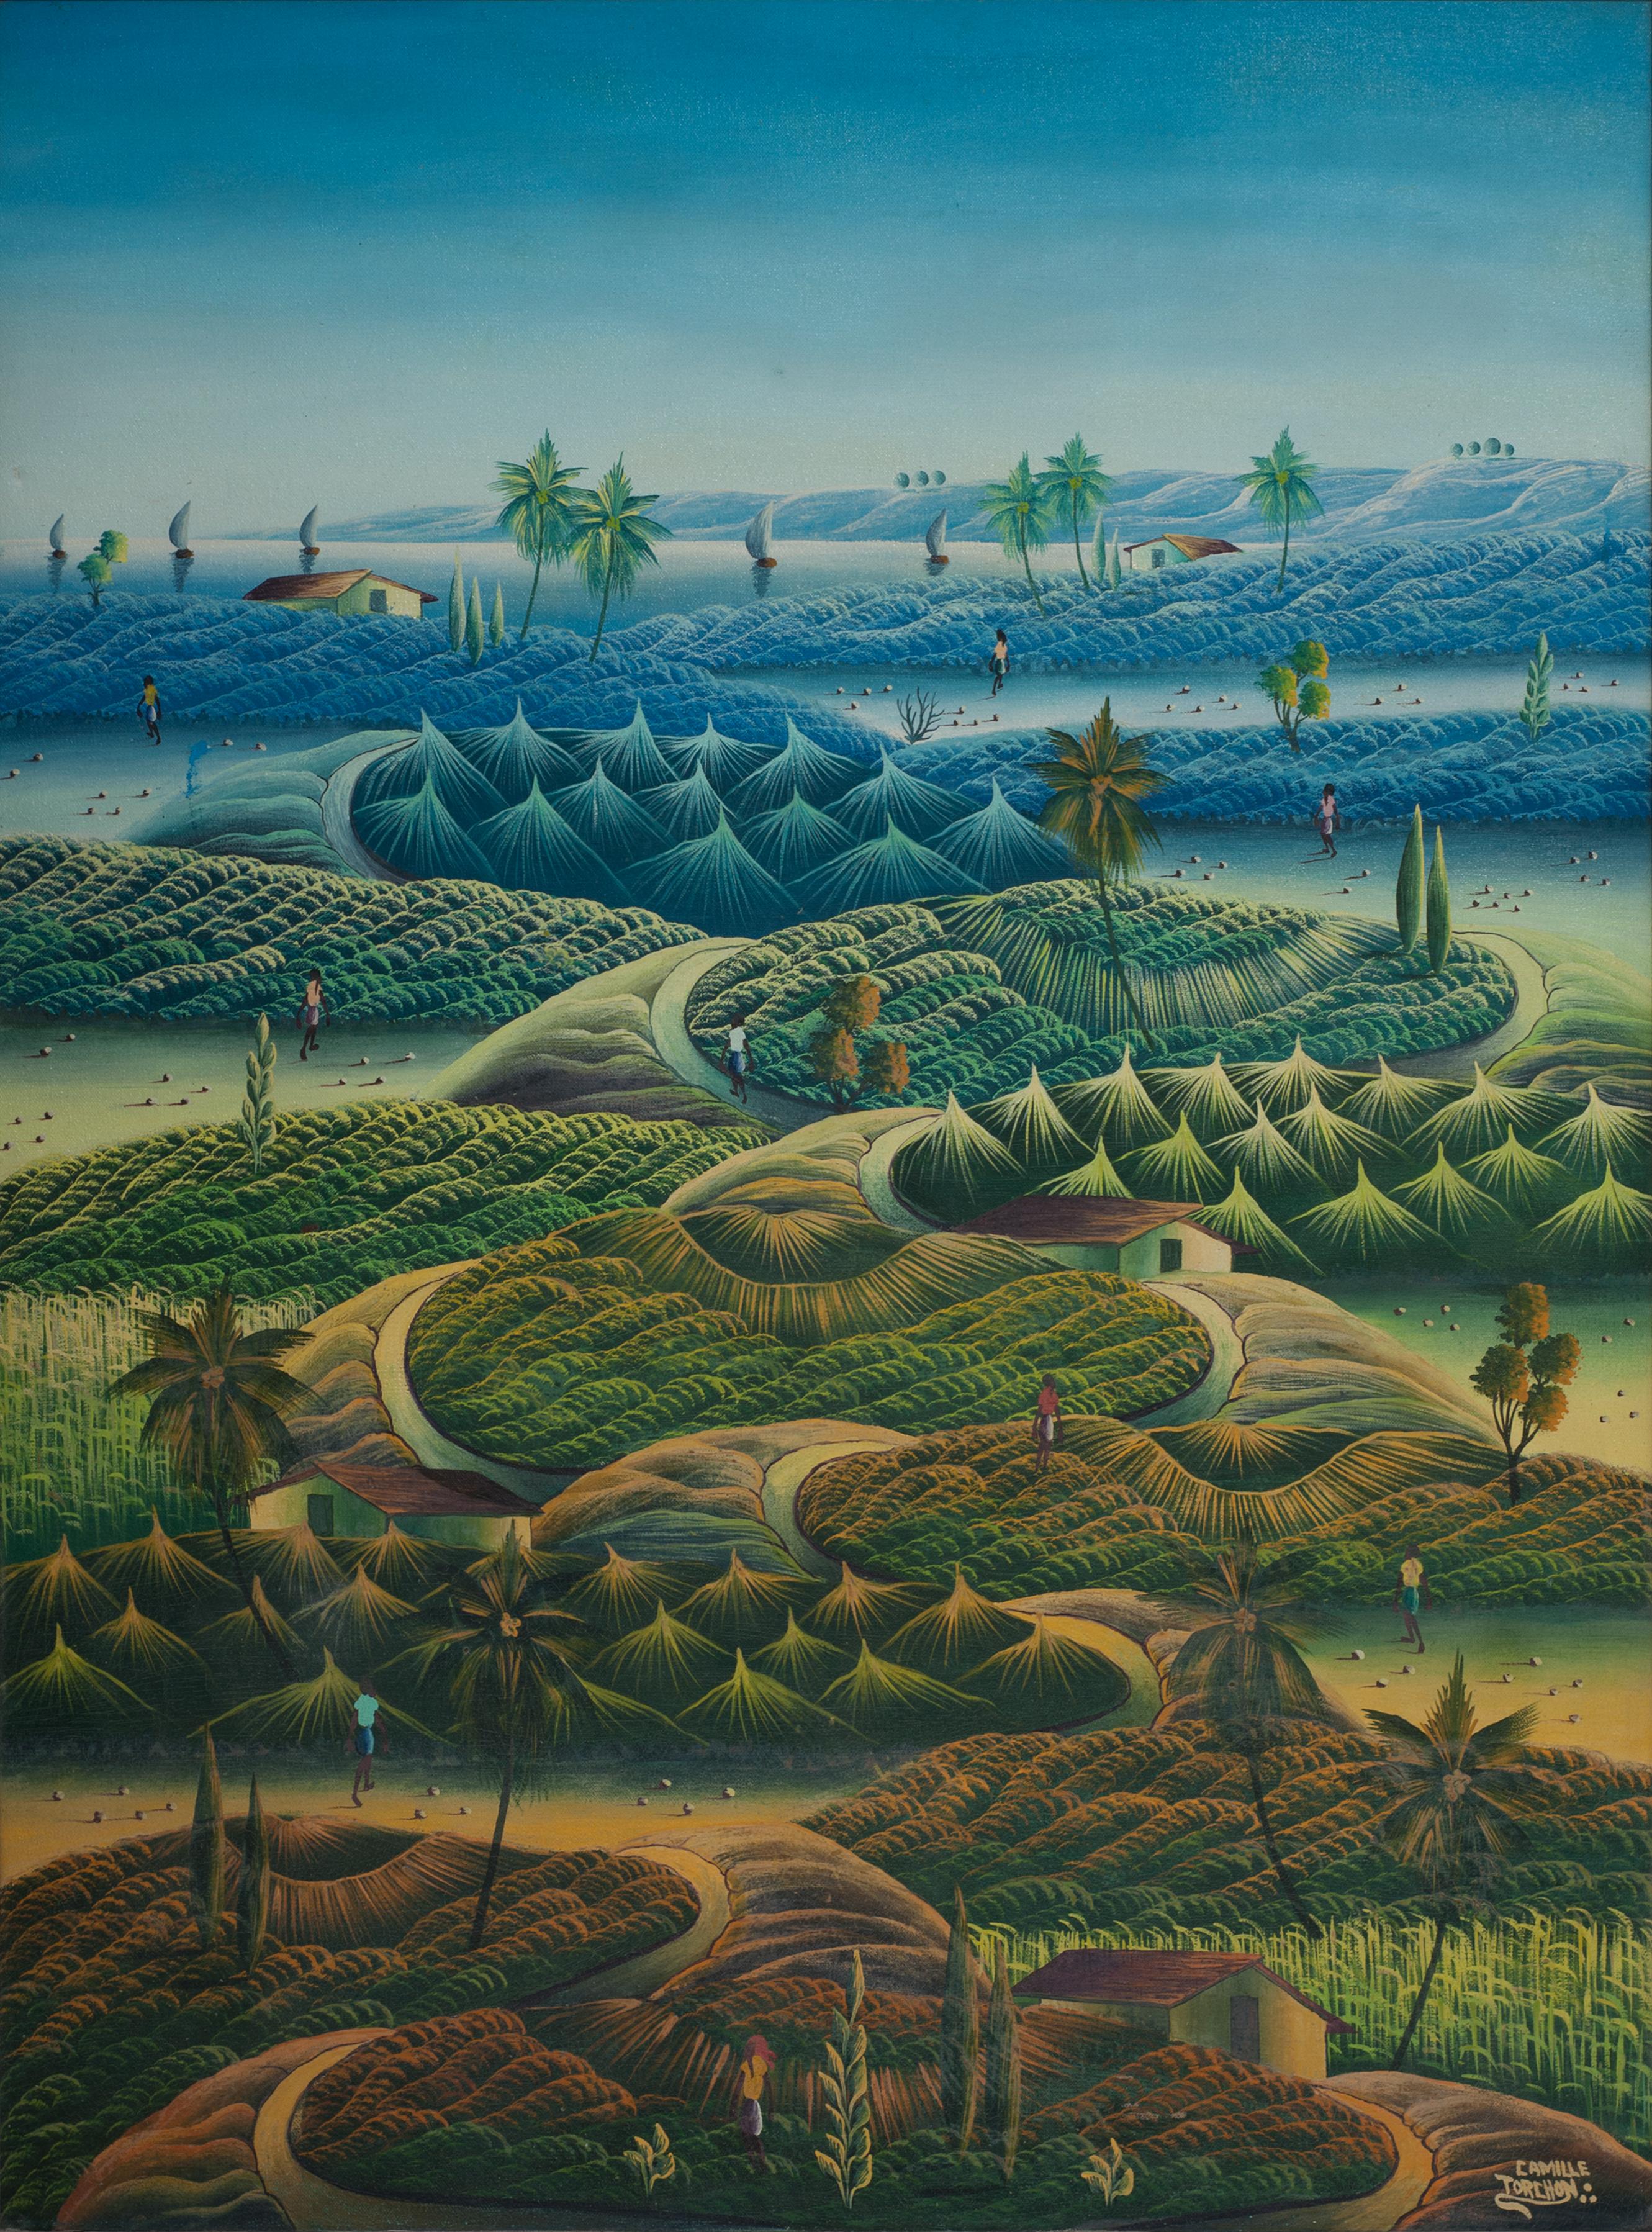 Torchon Camille 40X30 #9-4-90 Canvas